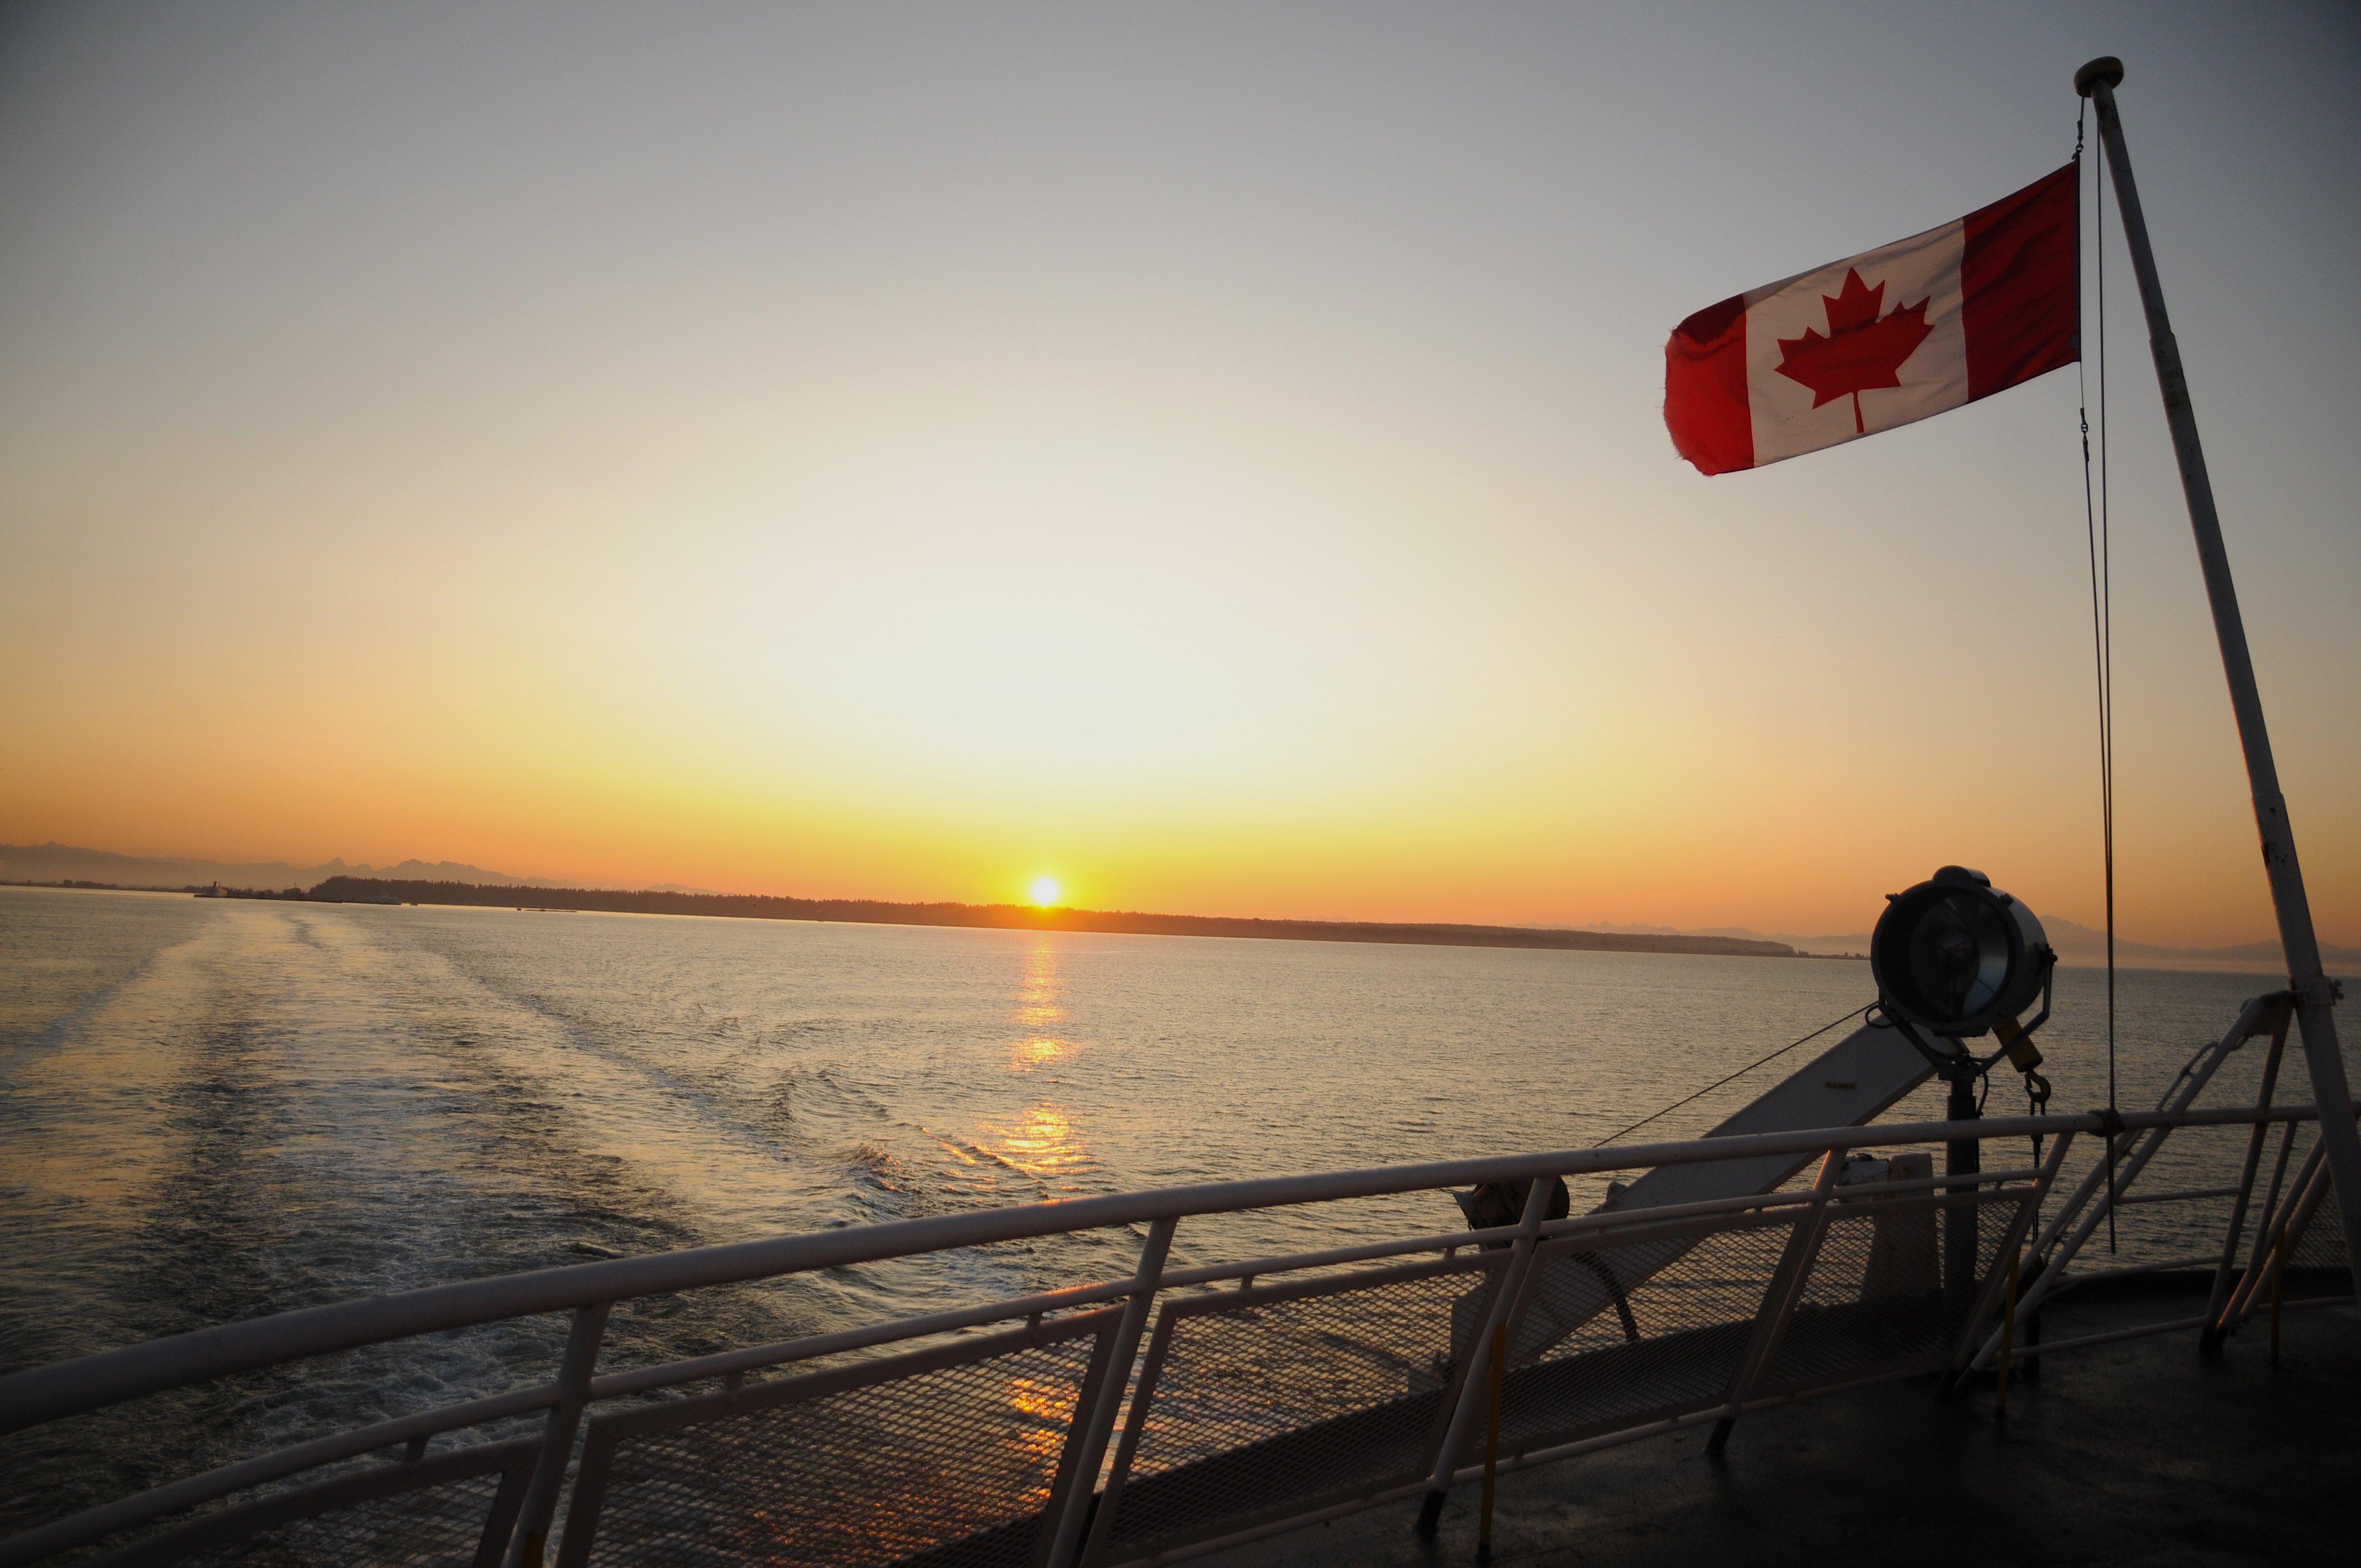 Port Renfrew / Vancouver Island Trip